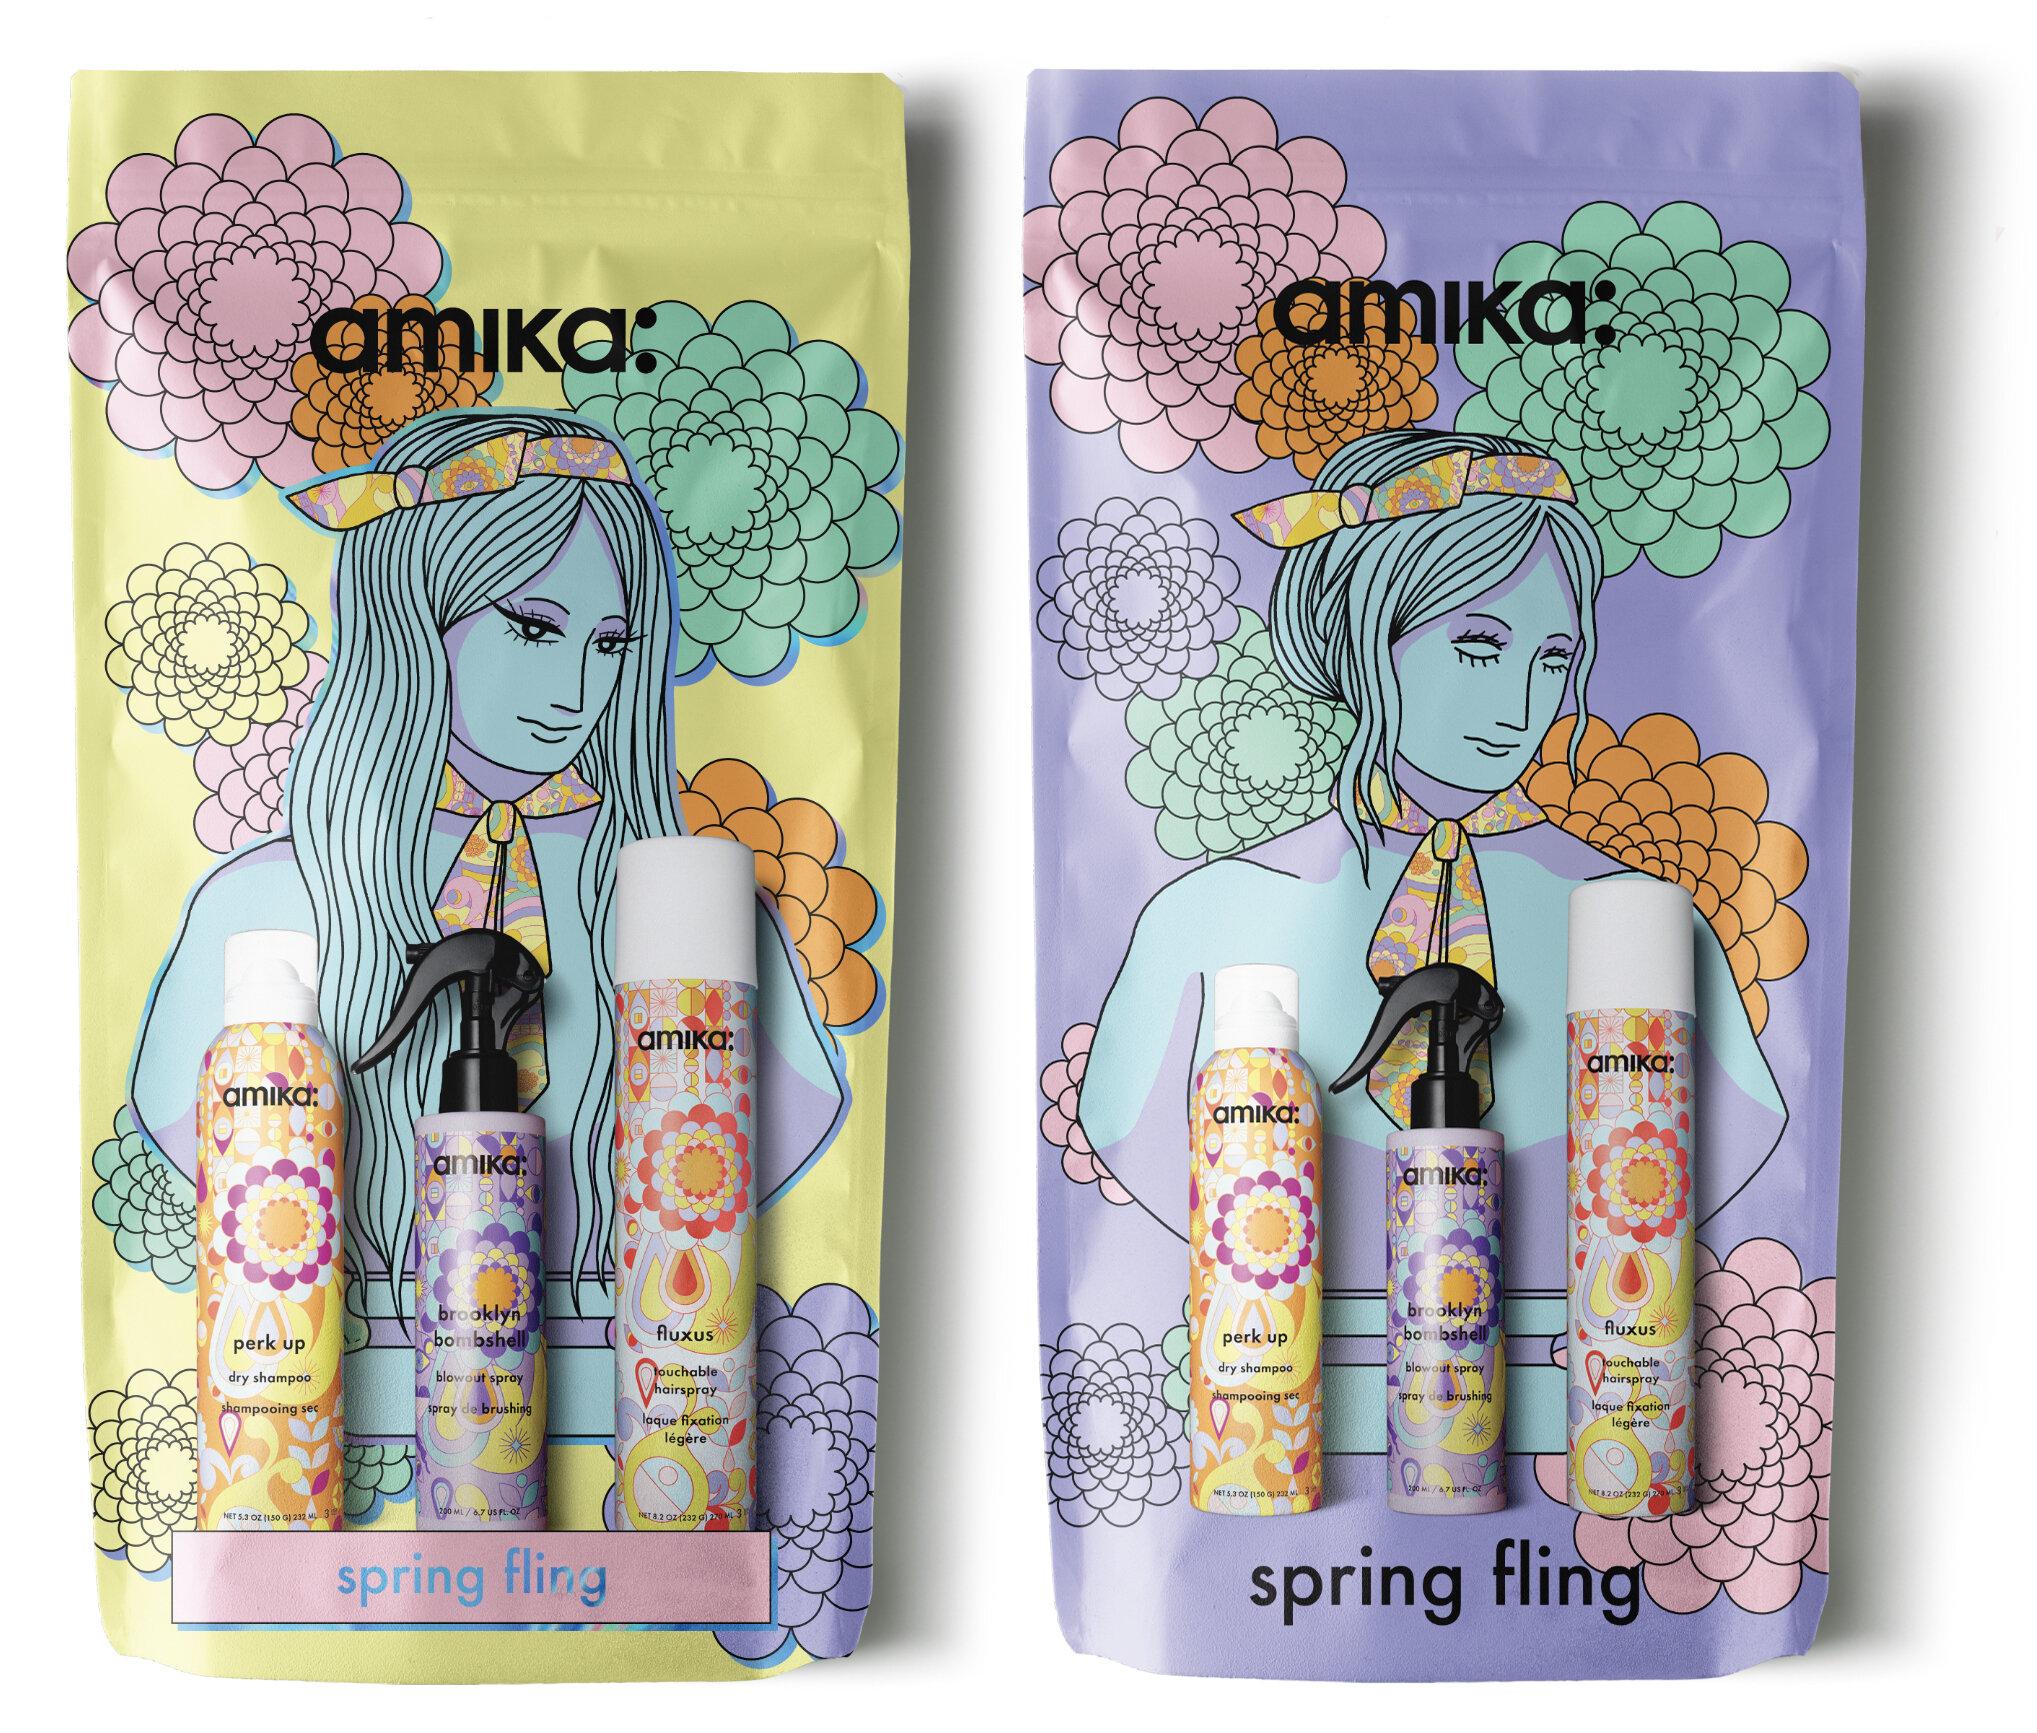 amika spring fling kit.jpg